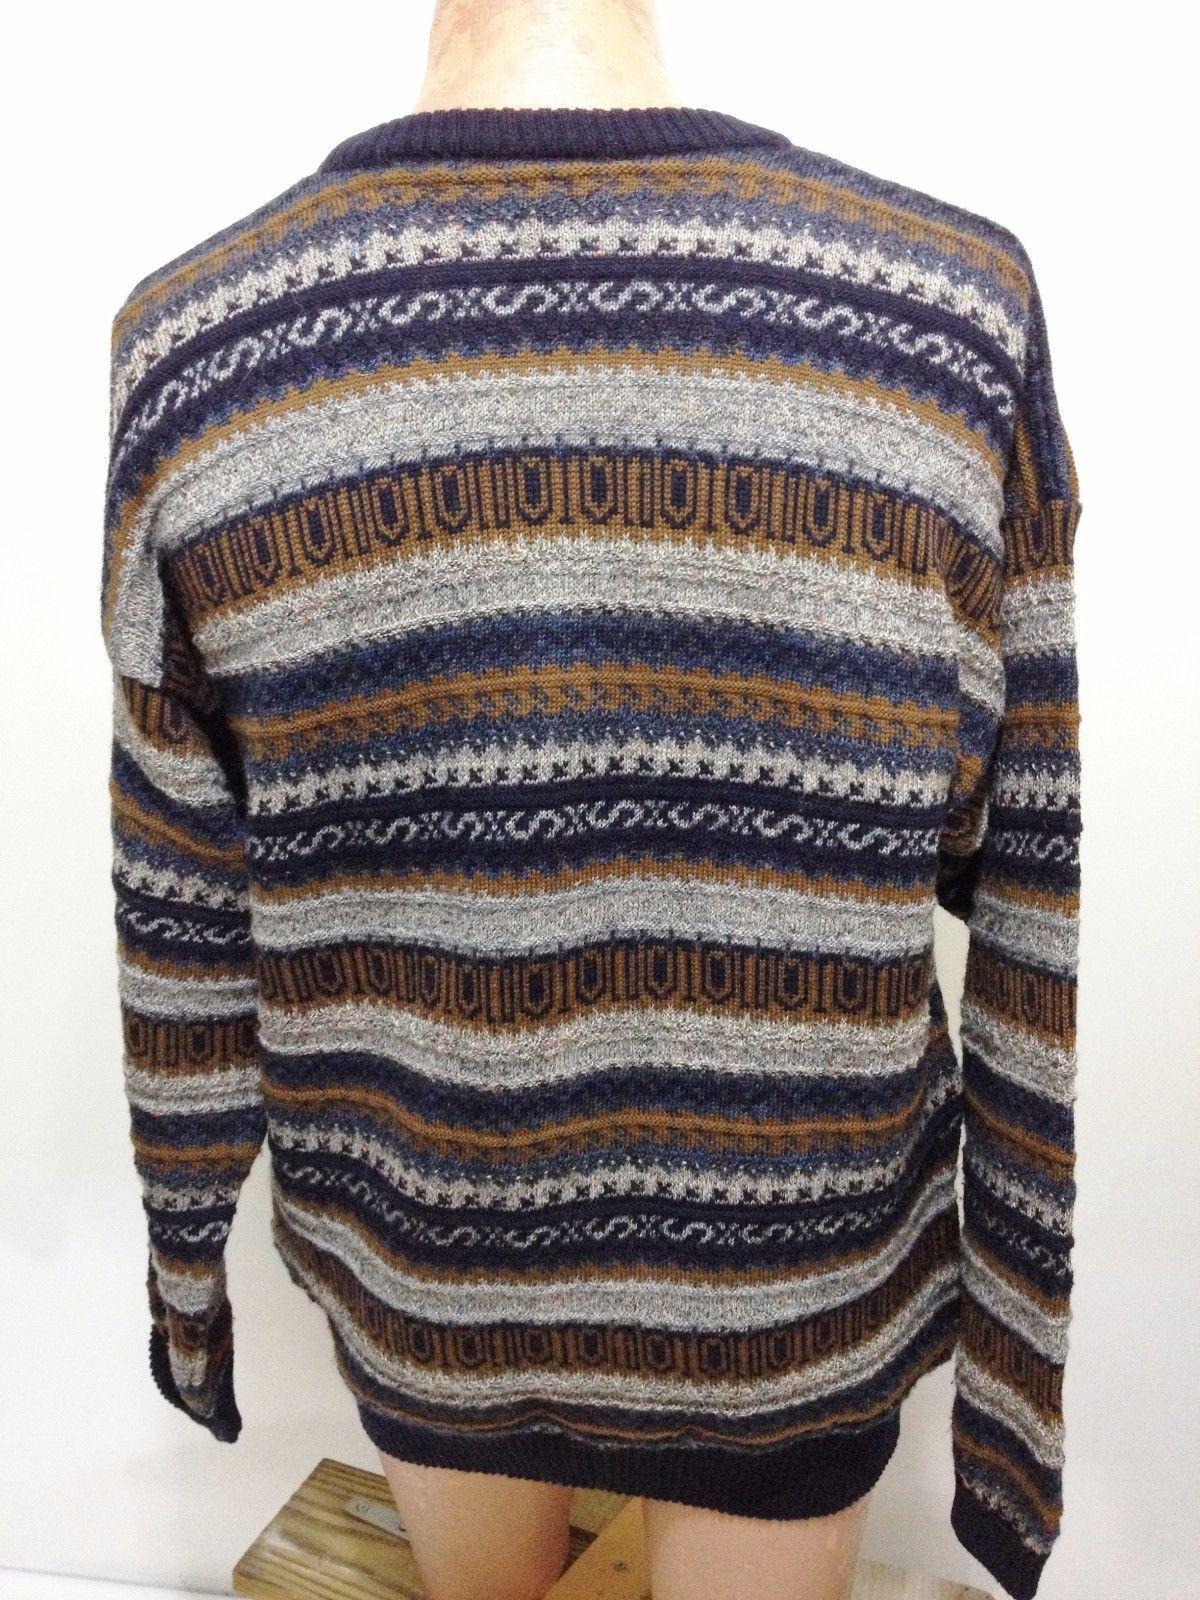 Gaeltarra Mens 46 Blue & Brown Wool-Alpaca Pullover Irish Sweater